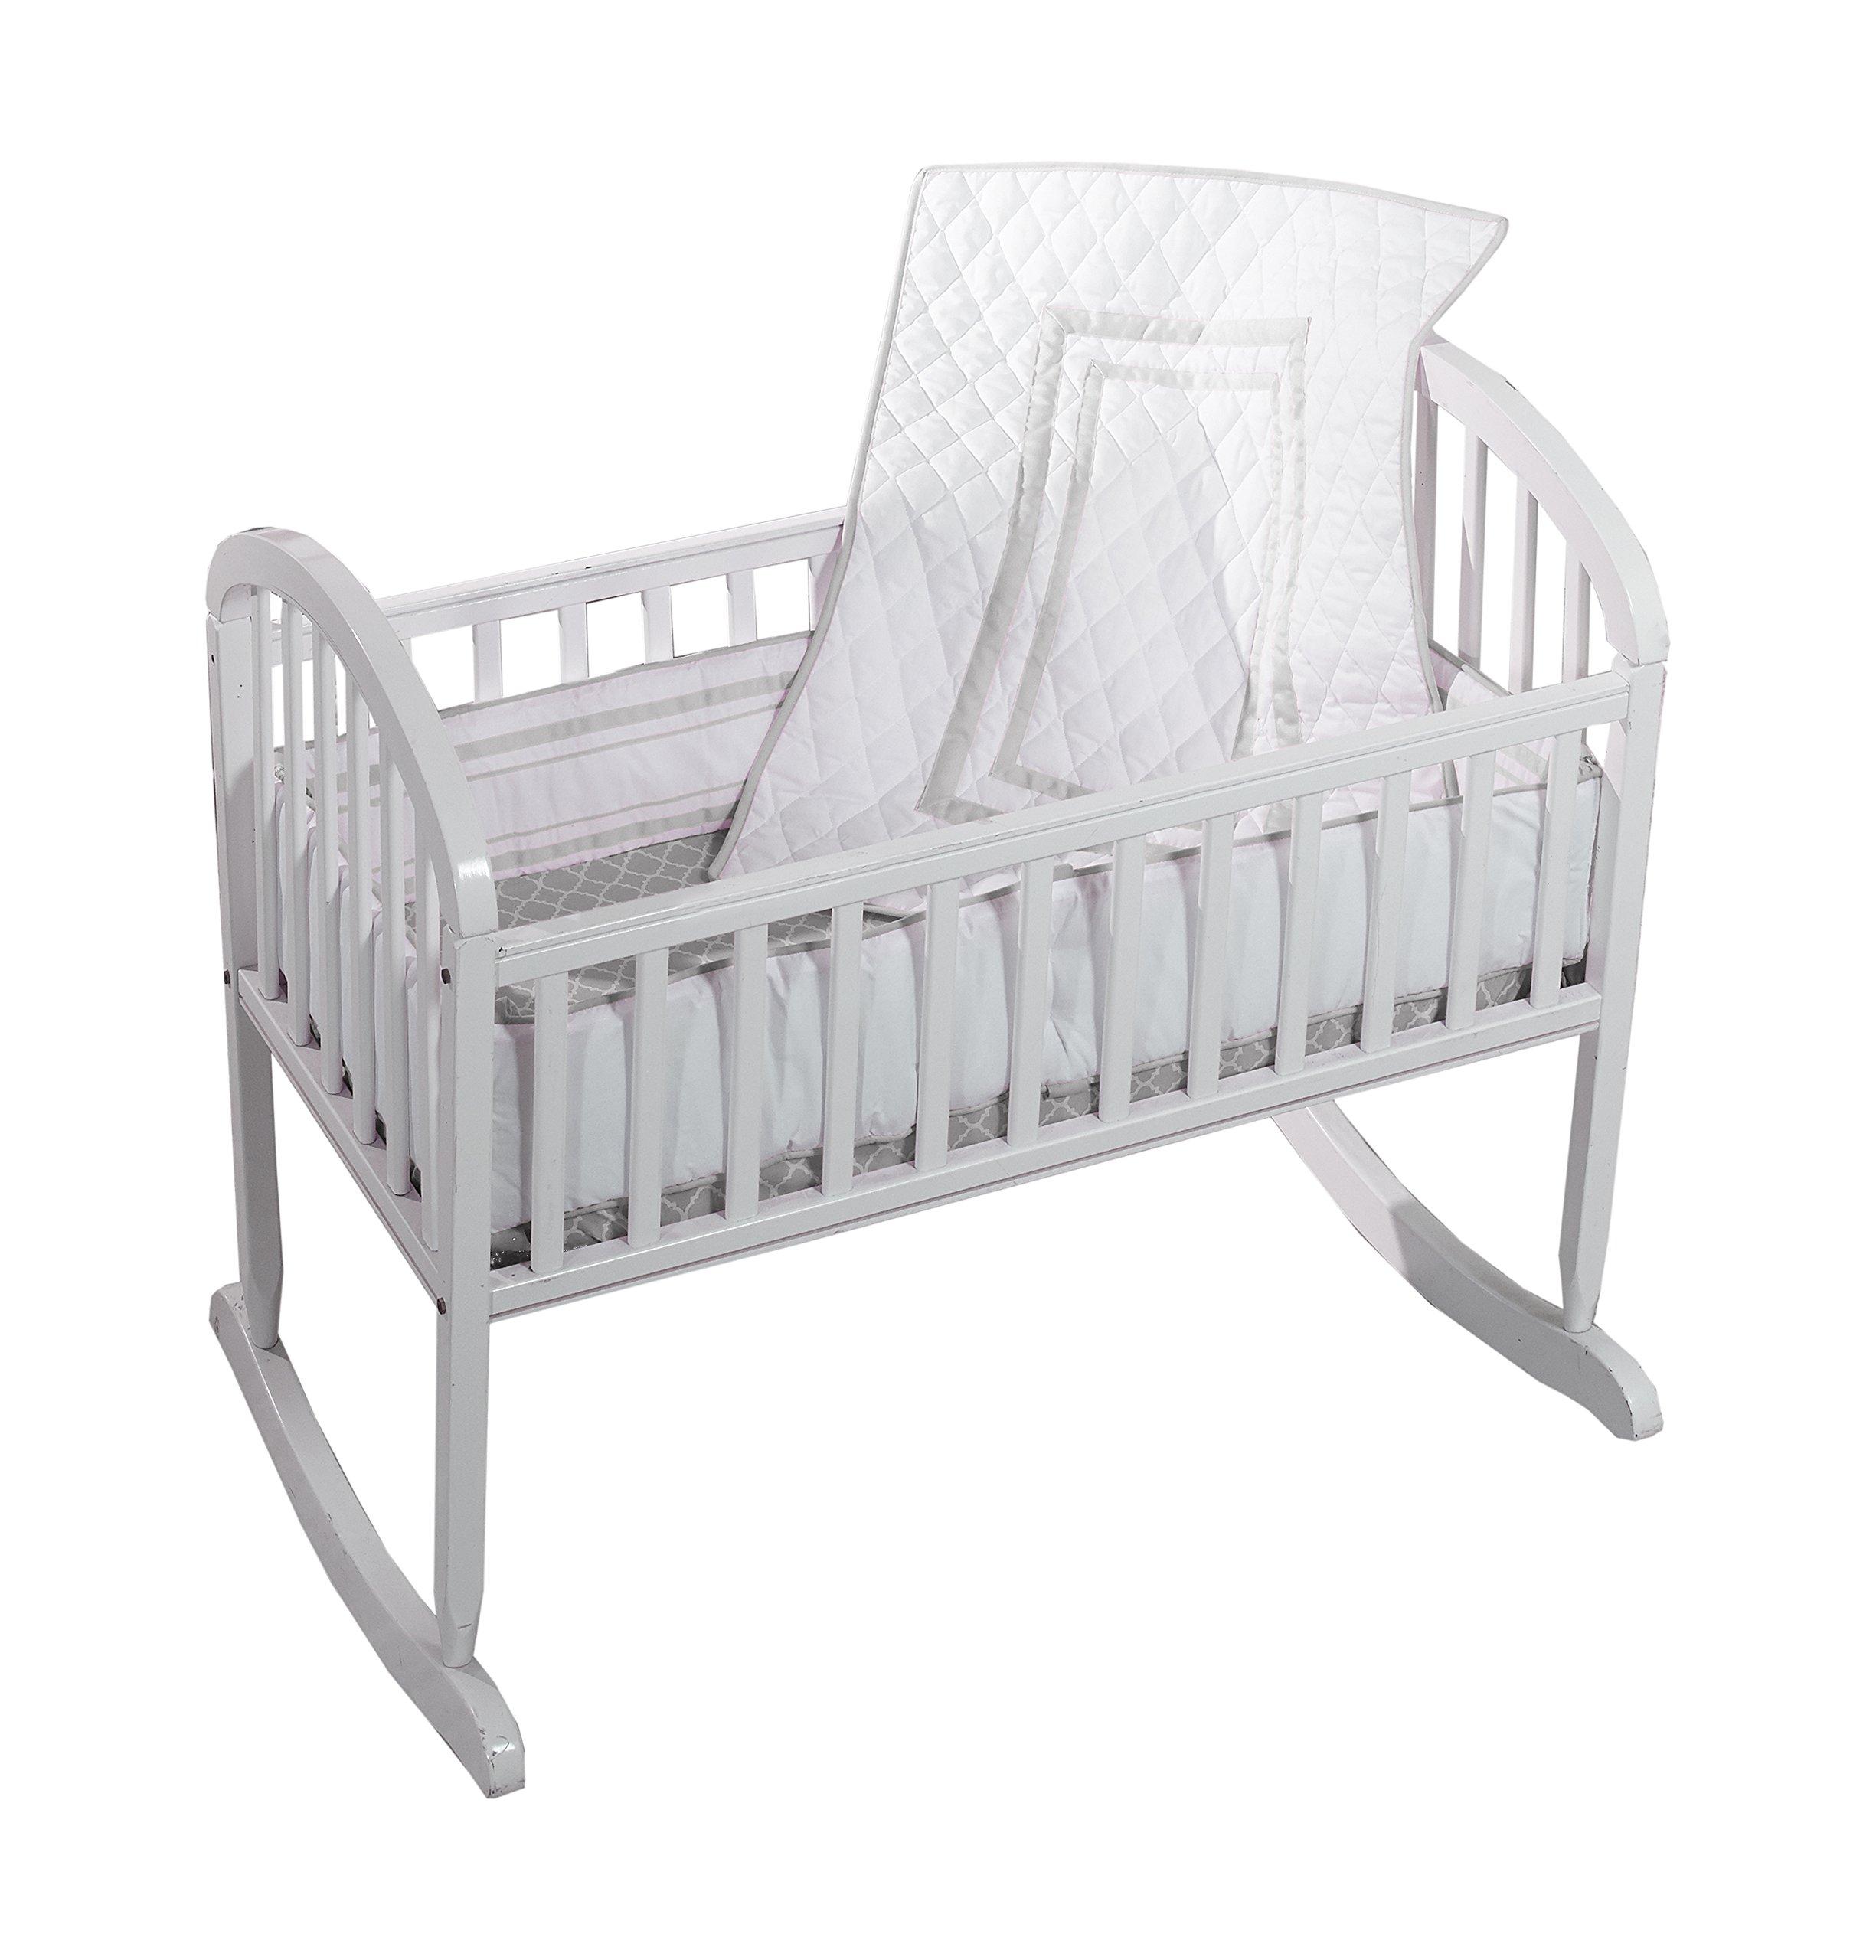 Baby Doll Bedding Soho Cradle Bedding Set with 100% cotton trellis design sheet, Grey